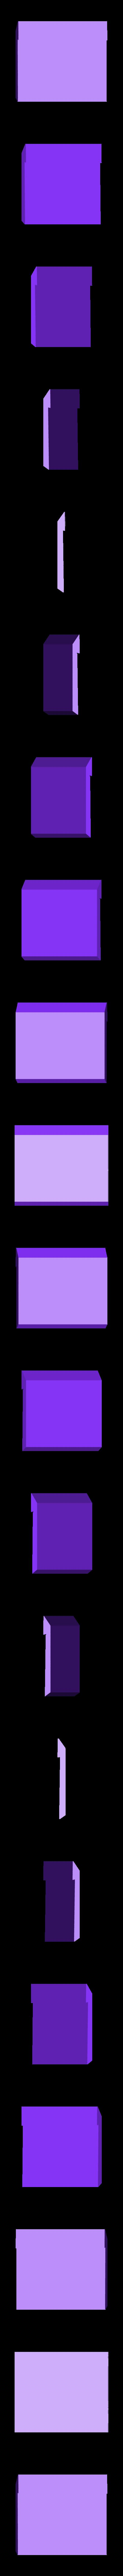 aframe_roof1.stl Download free STL file Saxon Burh A frame hut • 3D print object, Earsling